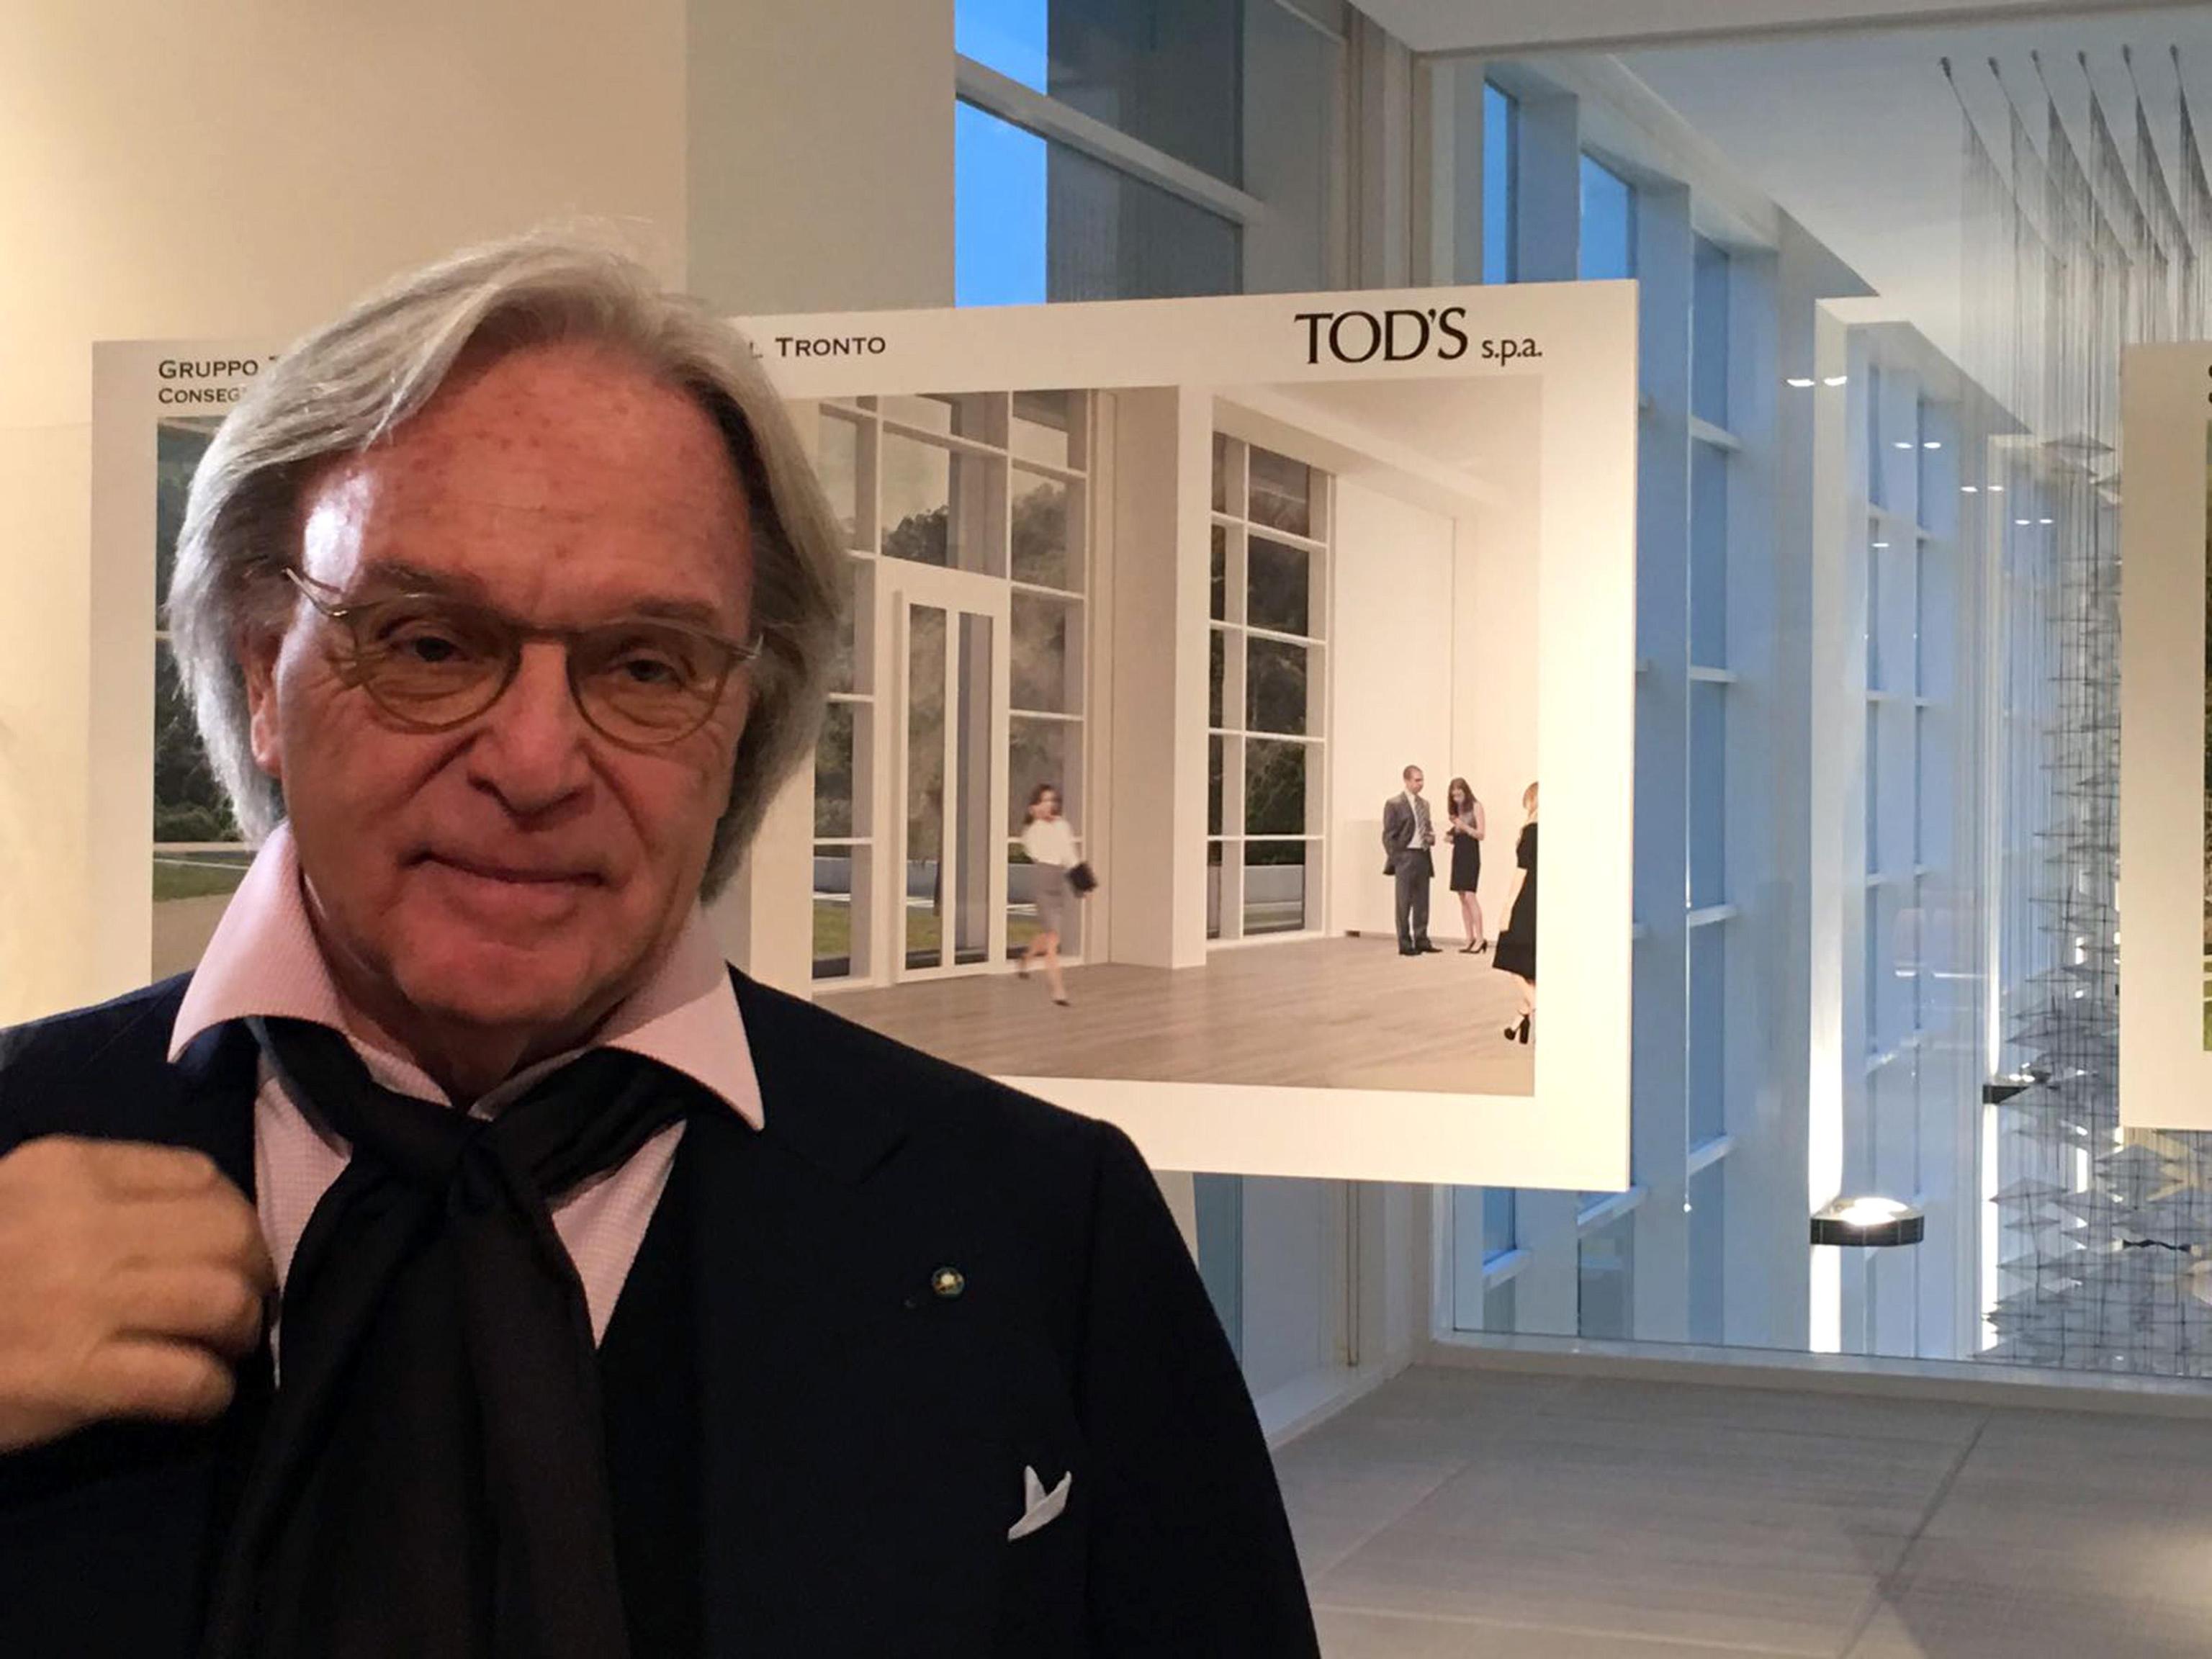 Tod's, Umberto Macchi di Cellere A.d